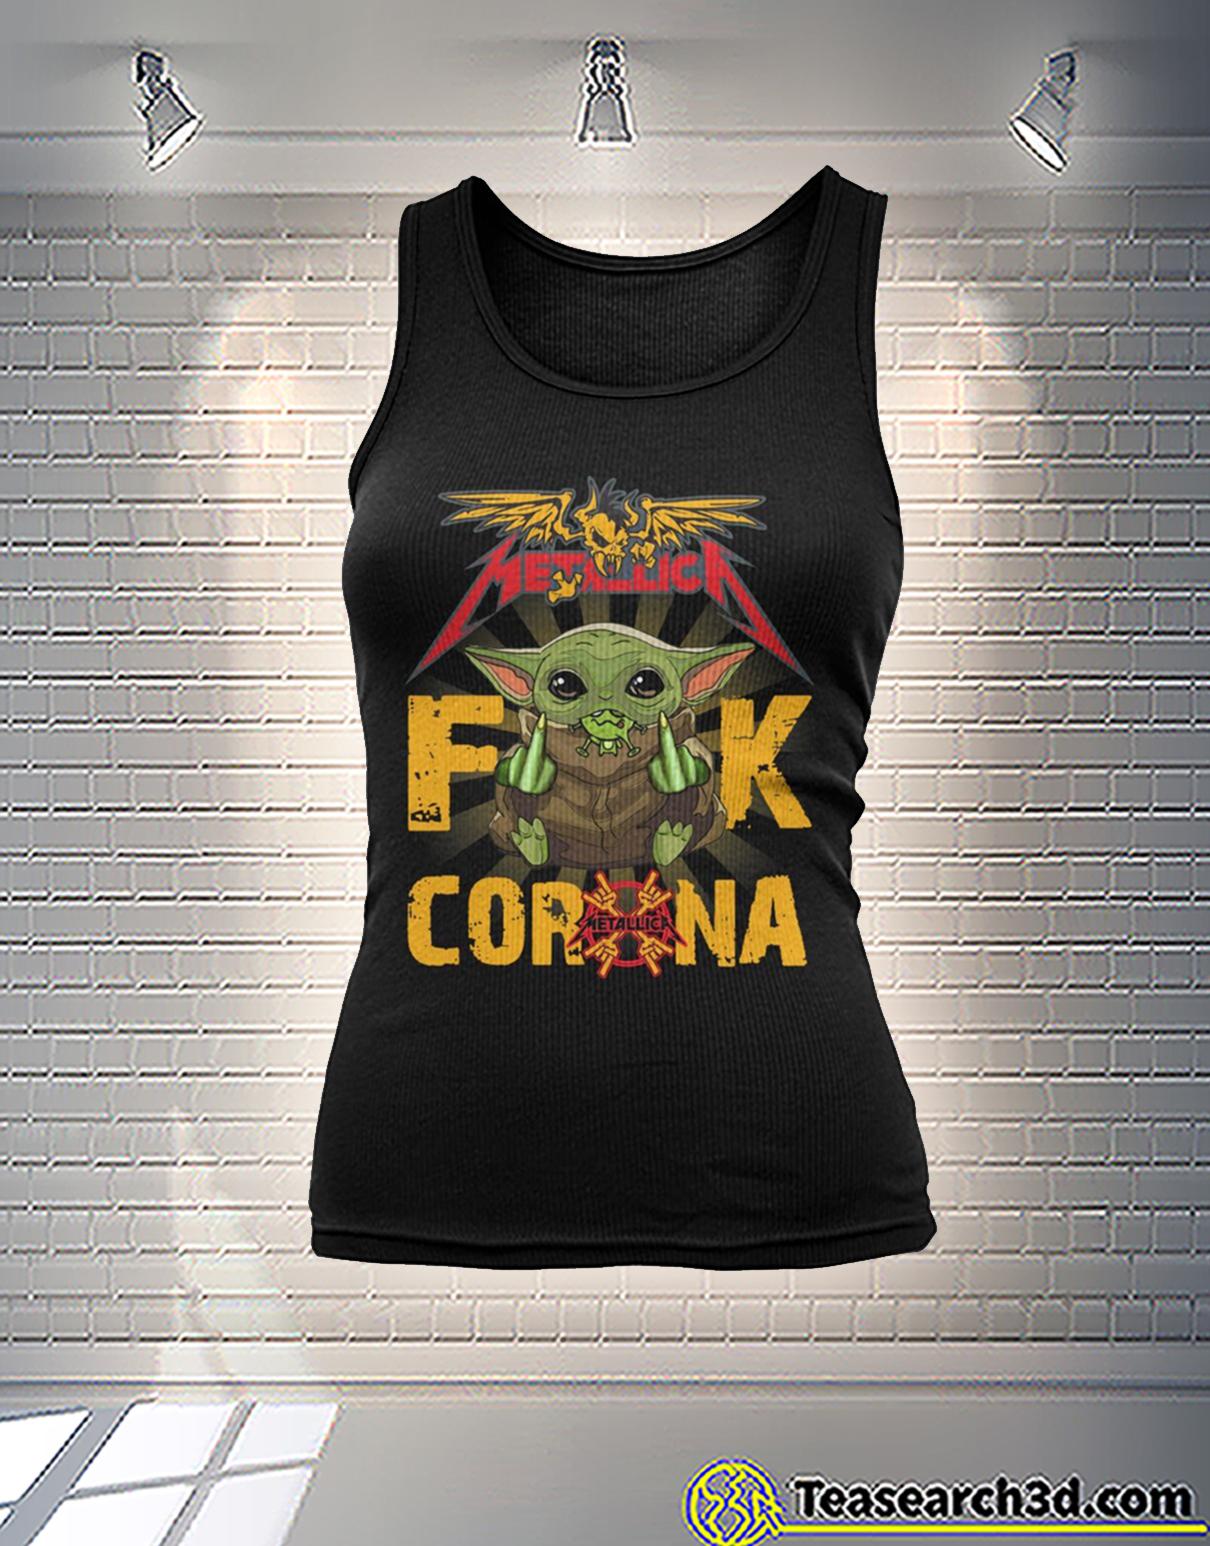 Baby yoda metallica fuck corona tank